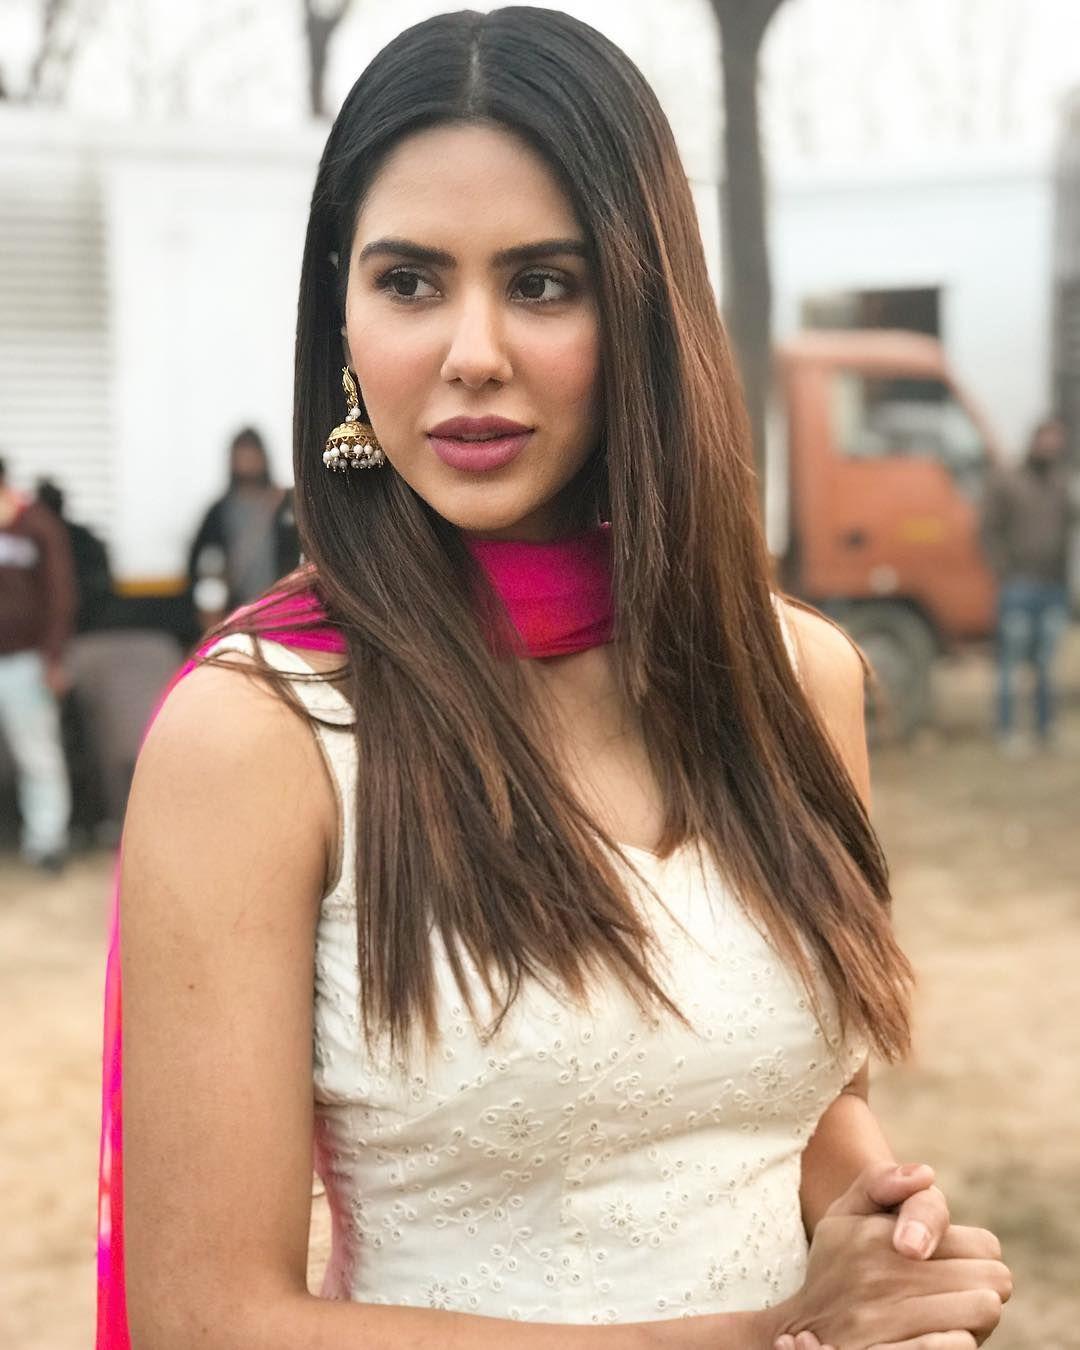 Pin By Balwinder Kaur On Punjabi Suits Att In 2018 Pinterest